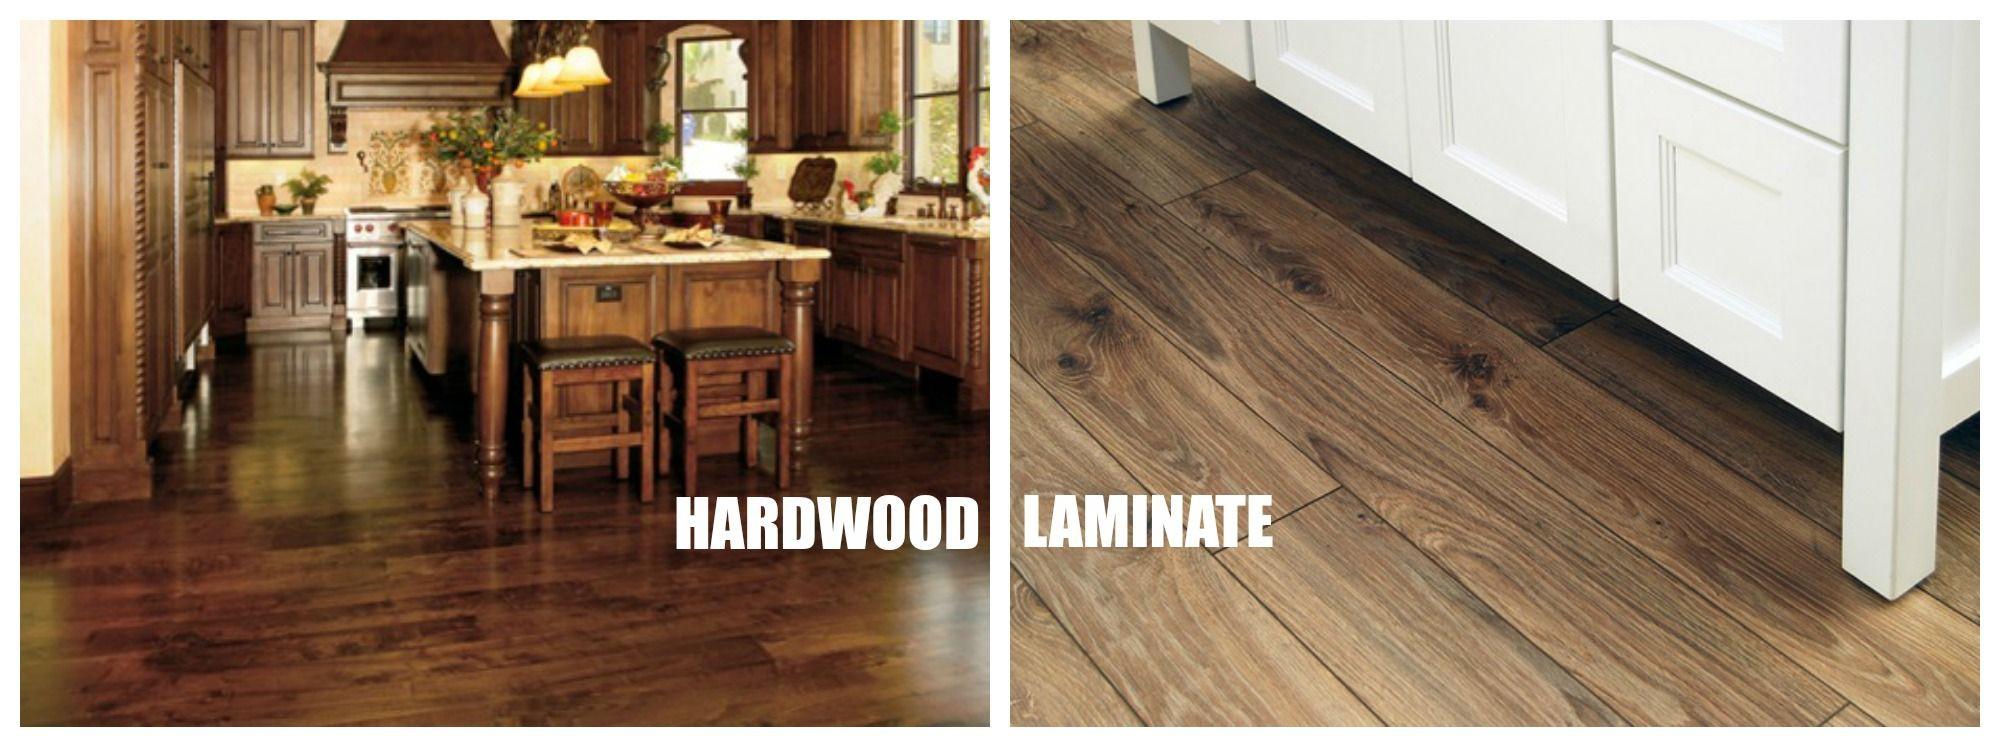 hardwood flooring ri of hardwood vs laminate flooring laminate flooring for hardwood vs laminate flooring builders surplus